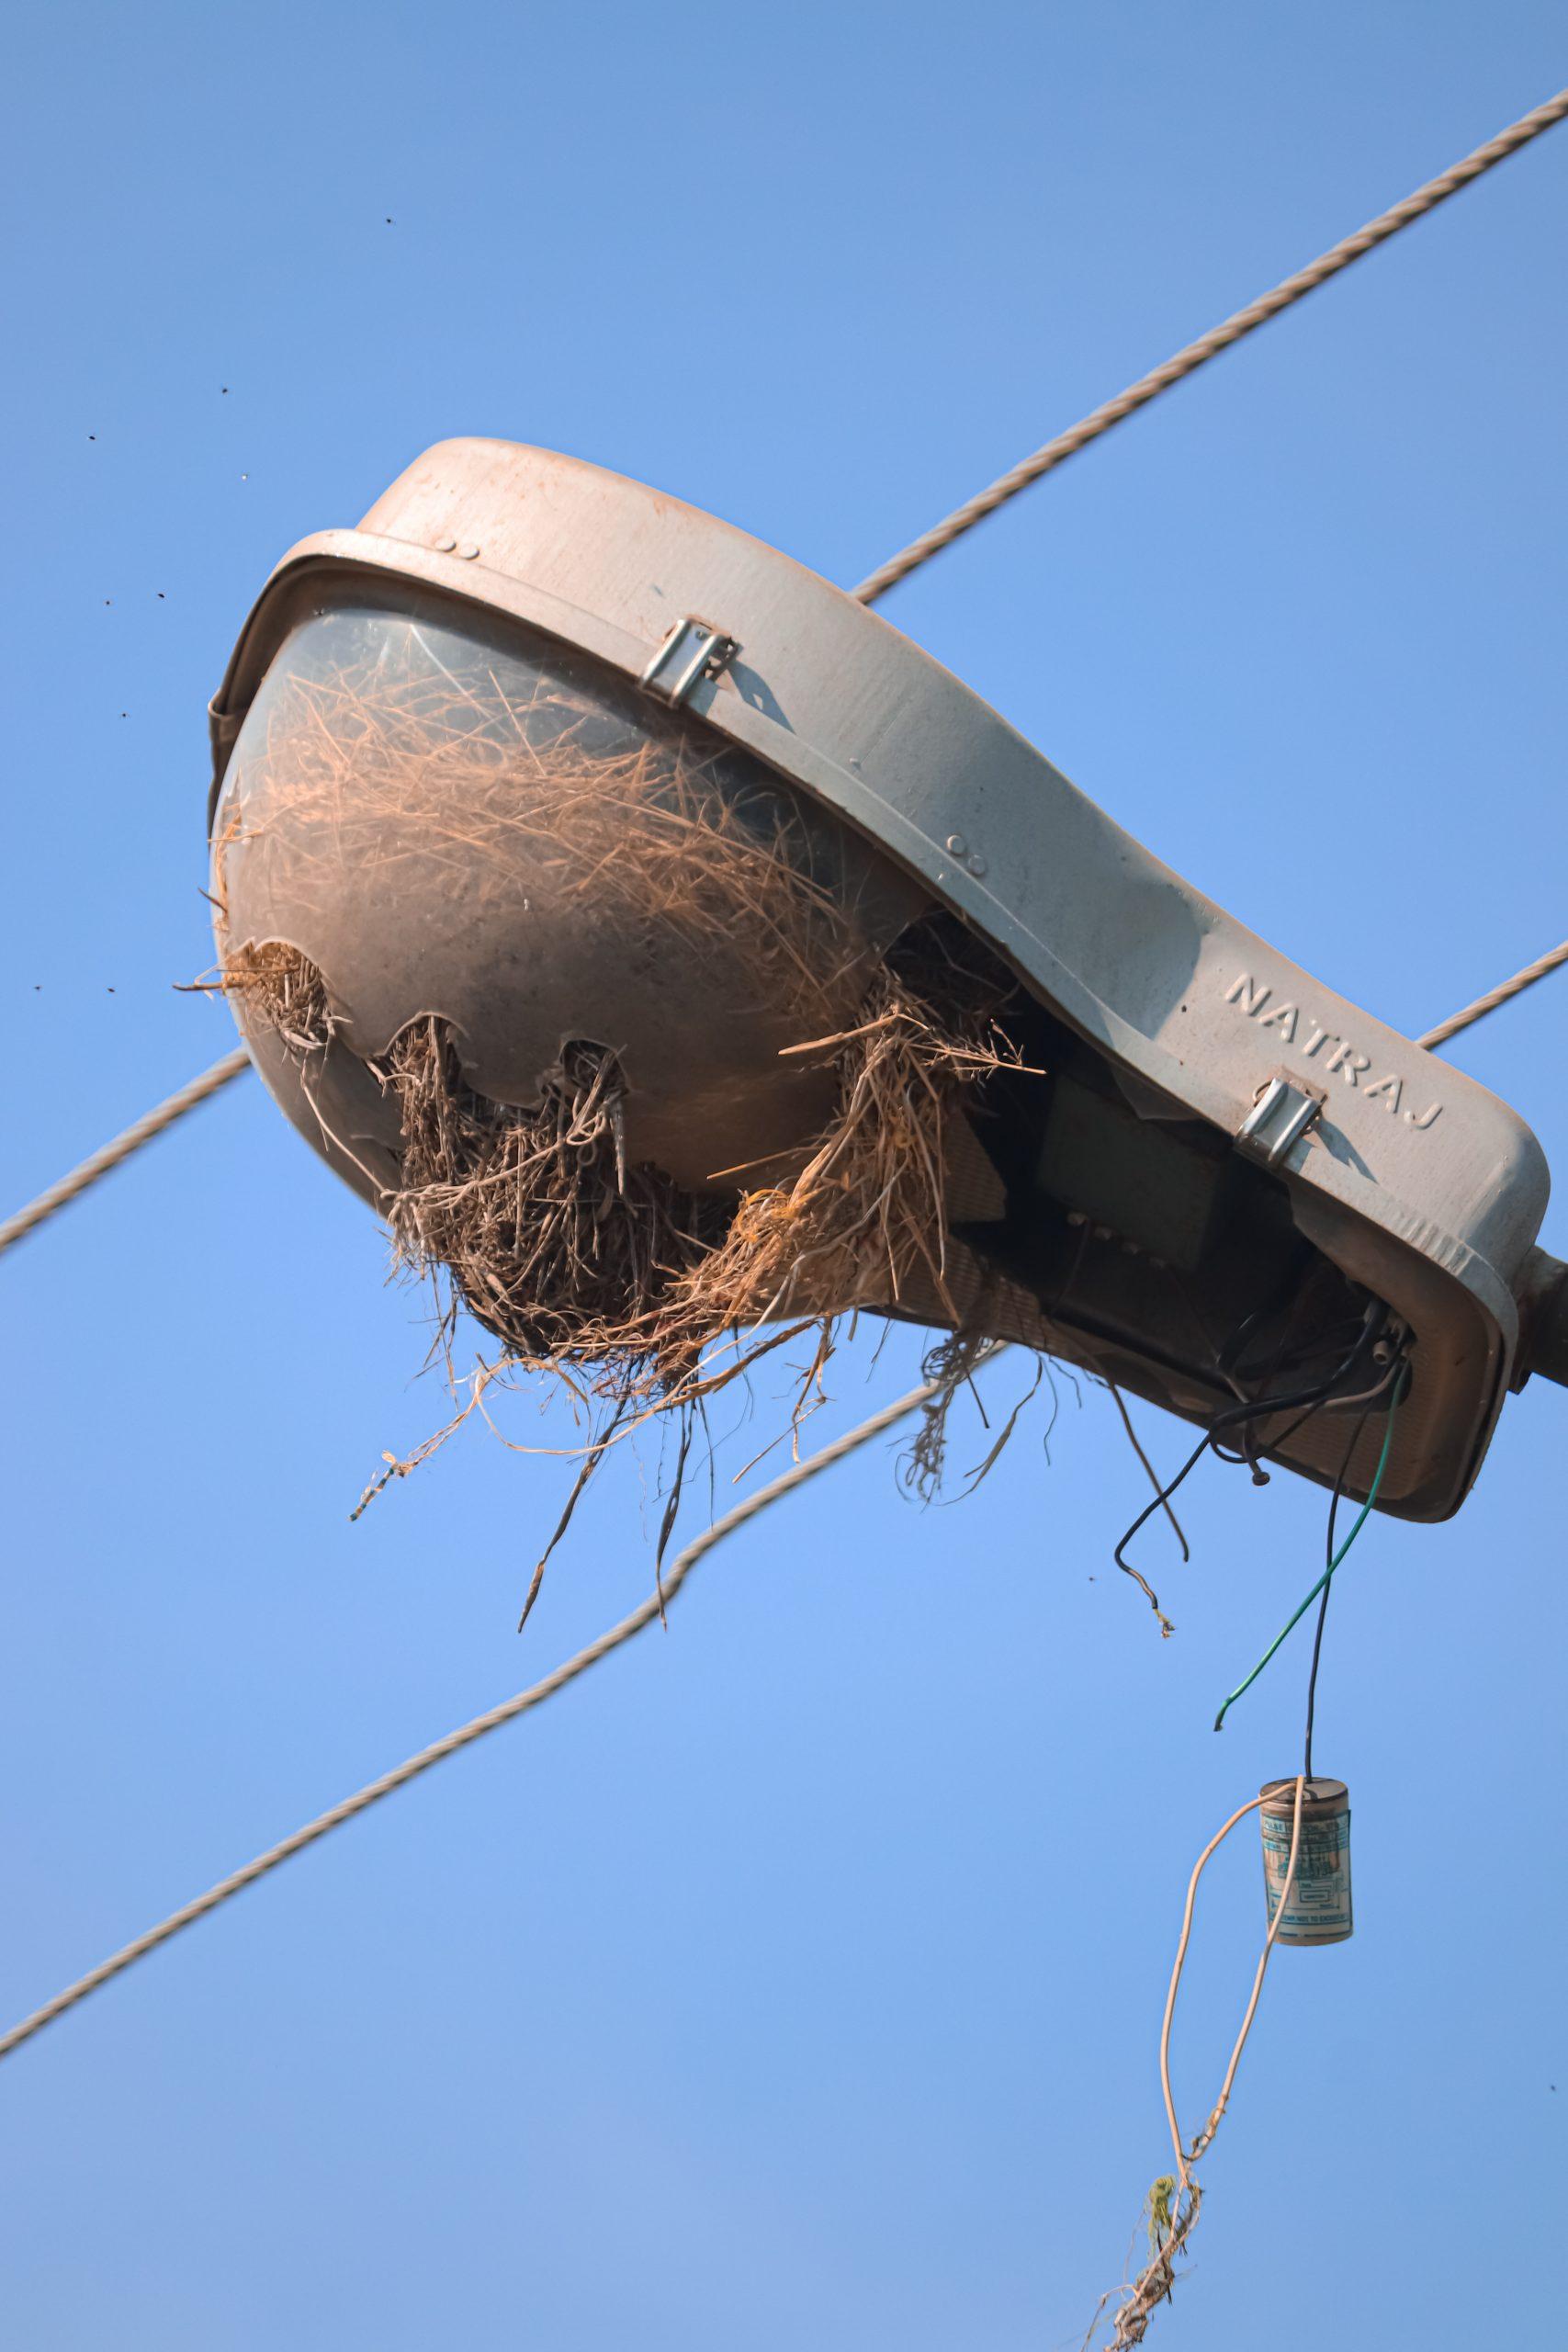 Birds' nest in a street light lamp